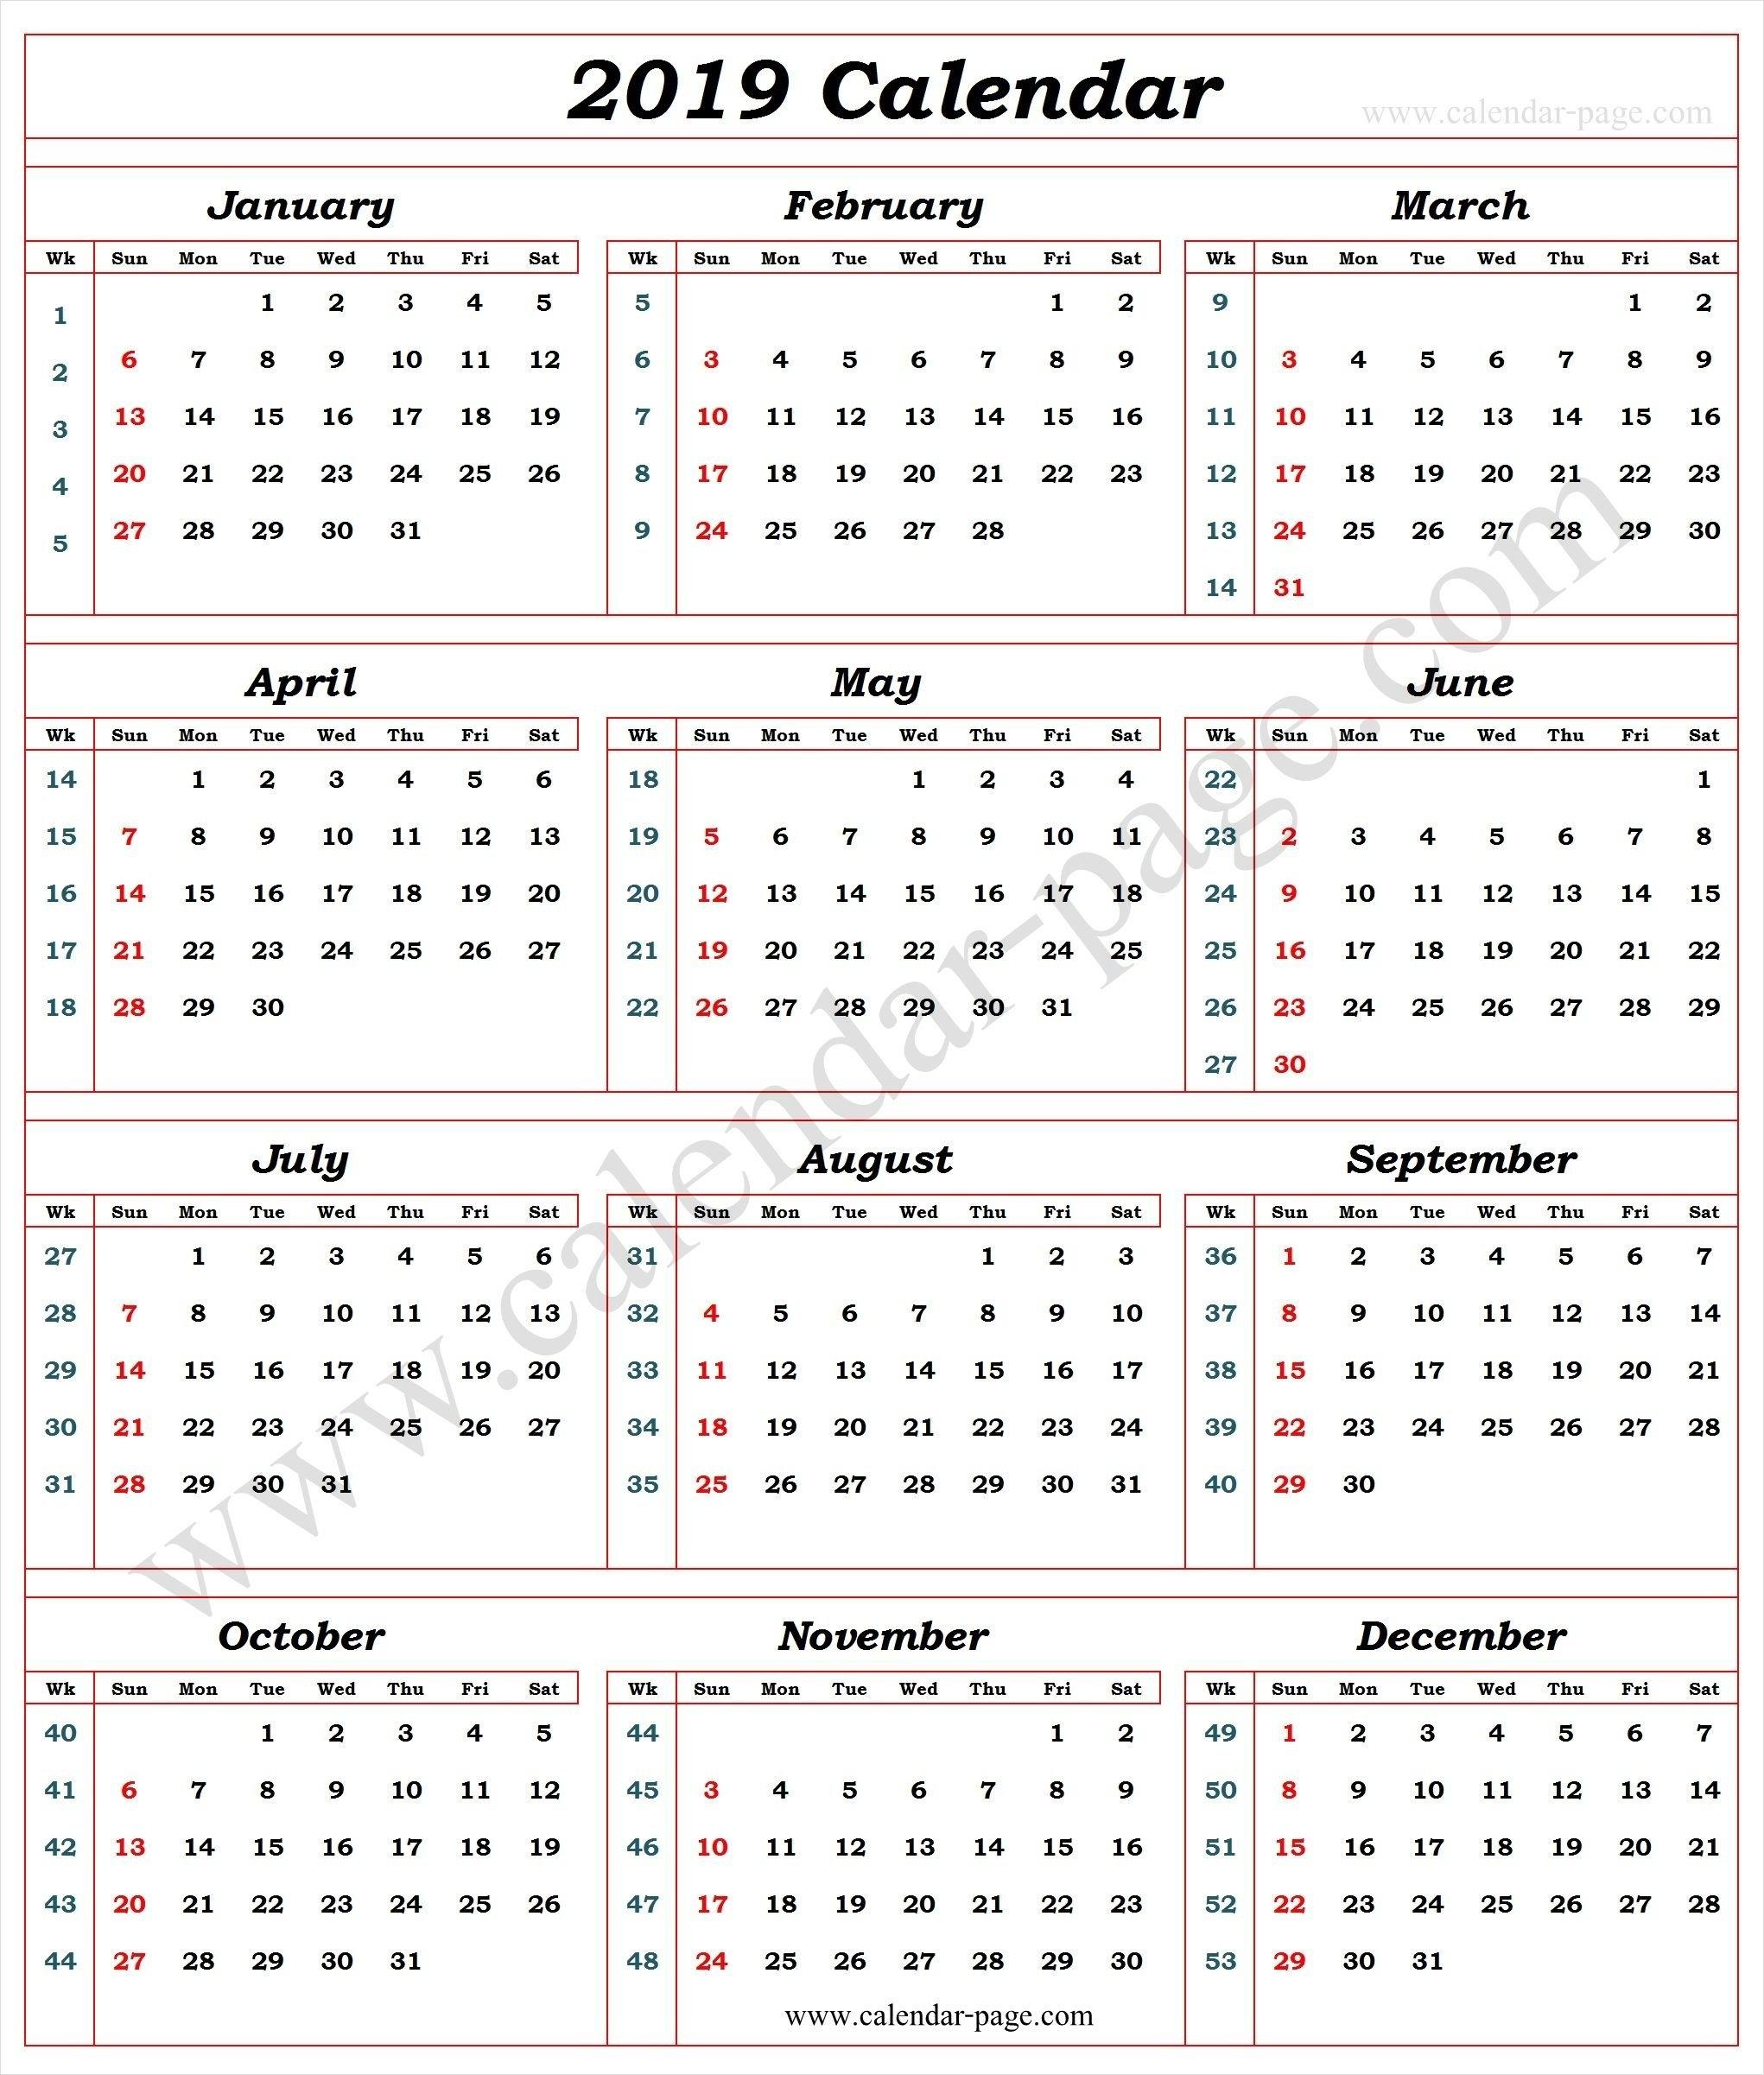 Calendar 2019 With Week Numbers | 2019 Calendar Template | Pinterest Week 8 Calendar 2019